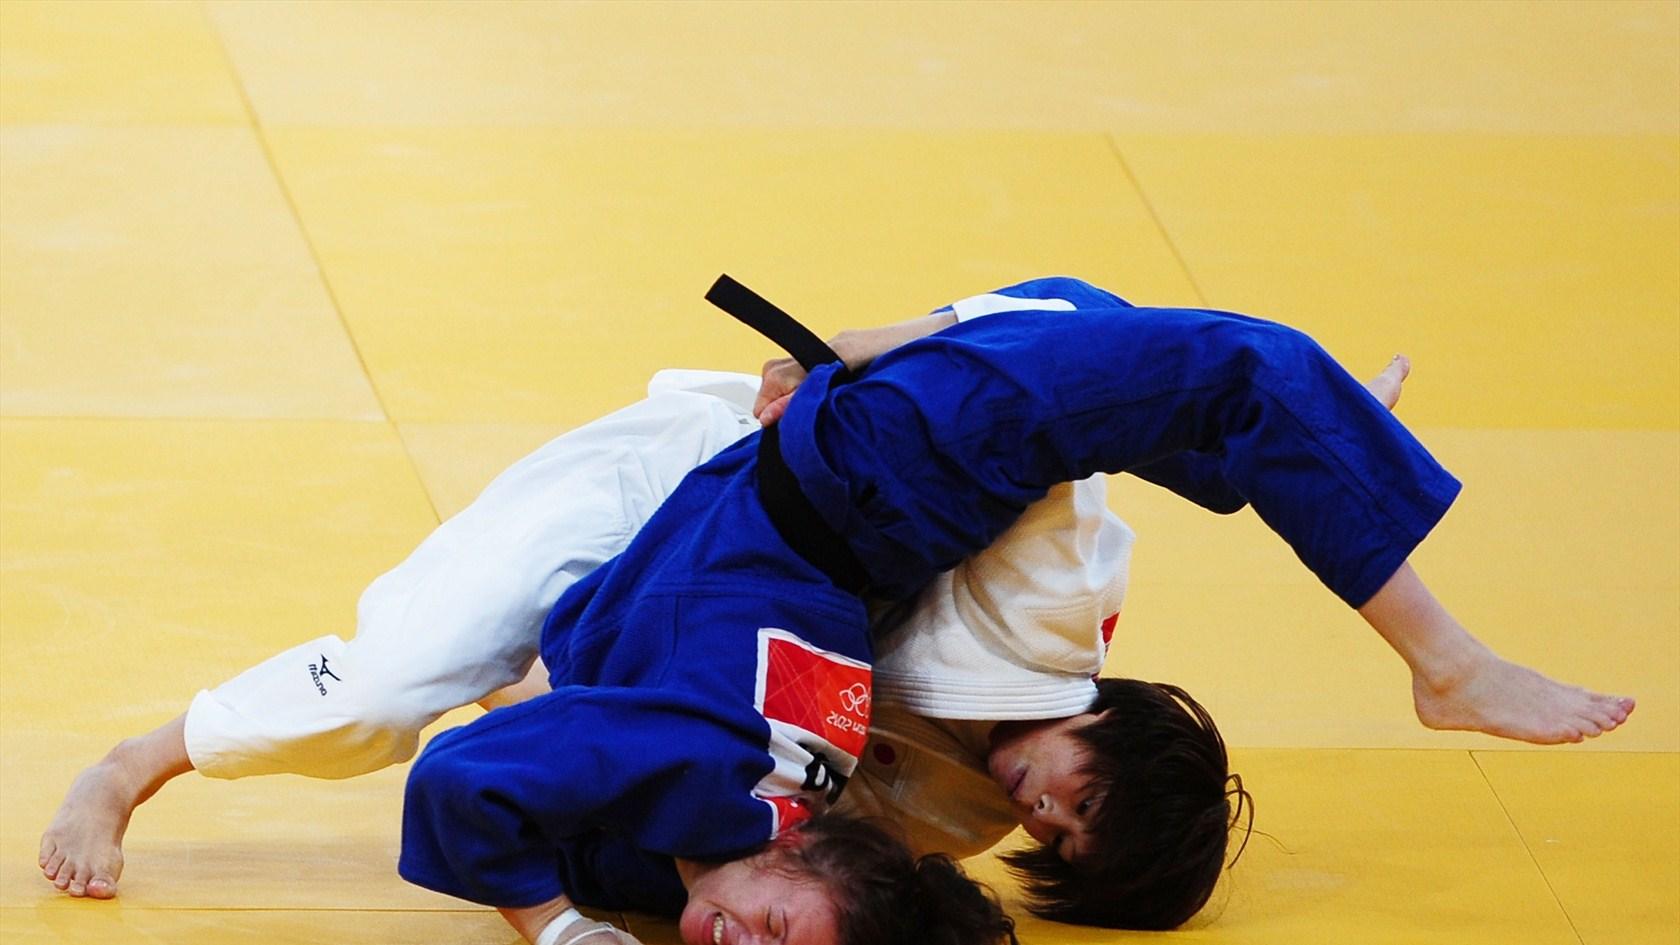 Judo Wallpaper Desktop Judo wallpapers 1680x945